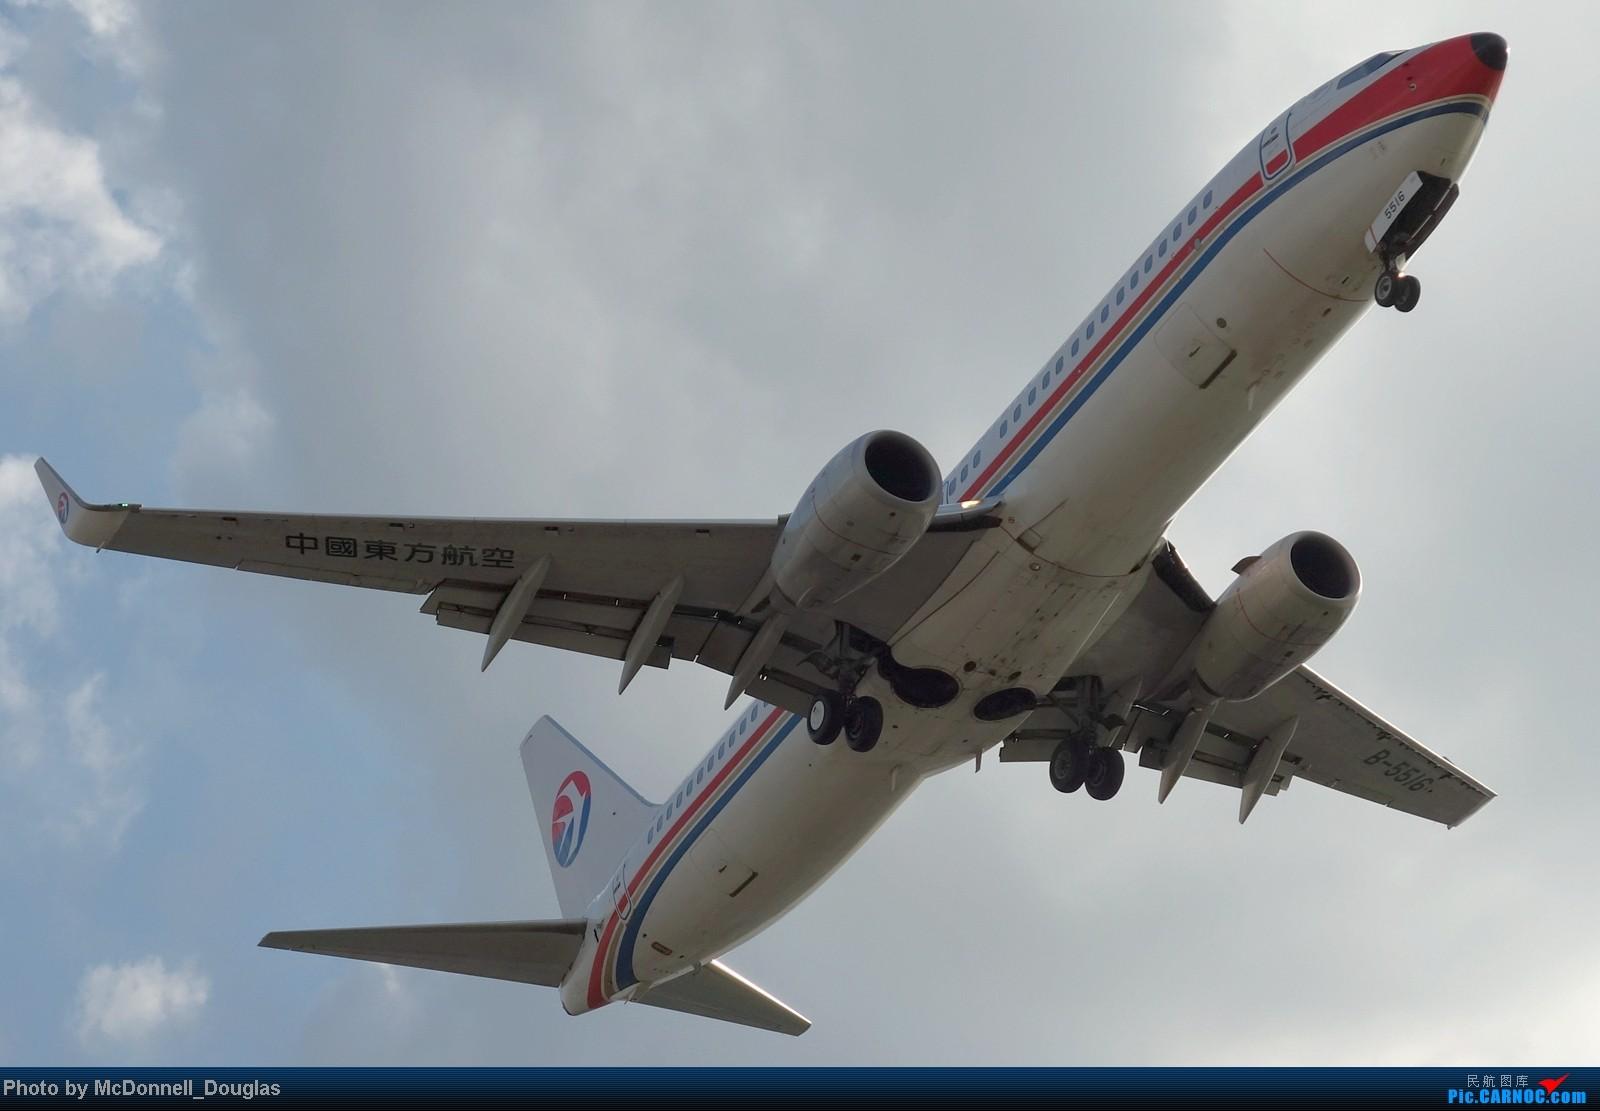 Re:[原创]【上海飞友会】ZSSS杂图一组 BOEING 737-800 B-5516 中国上海虹桥机场